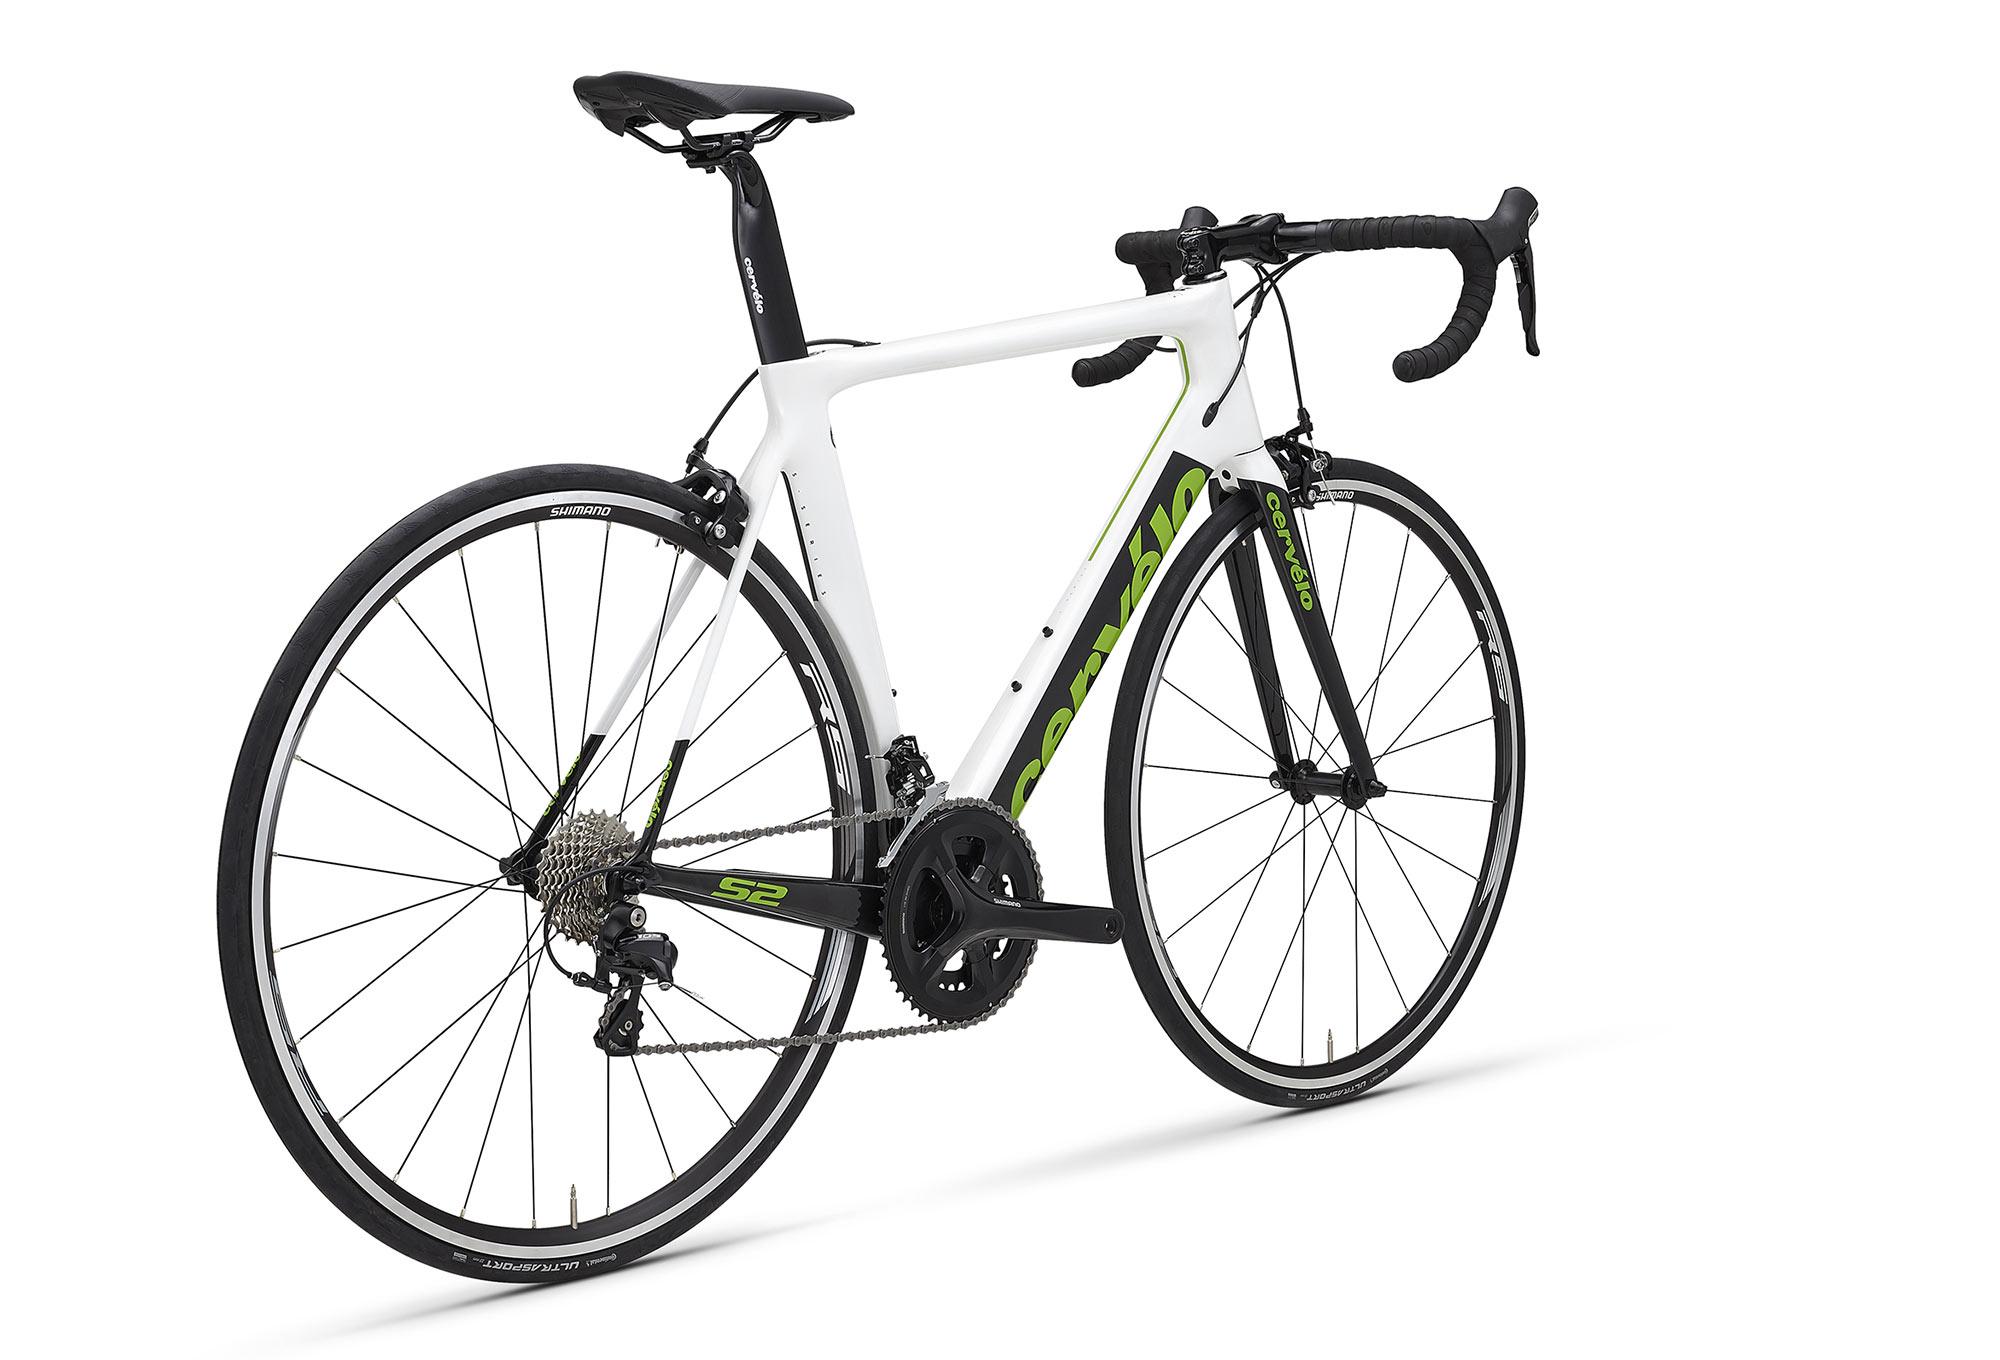 Cervélo S2 Road Bike Shimano 105 5800 11S 2018 White